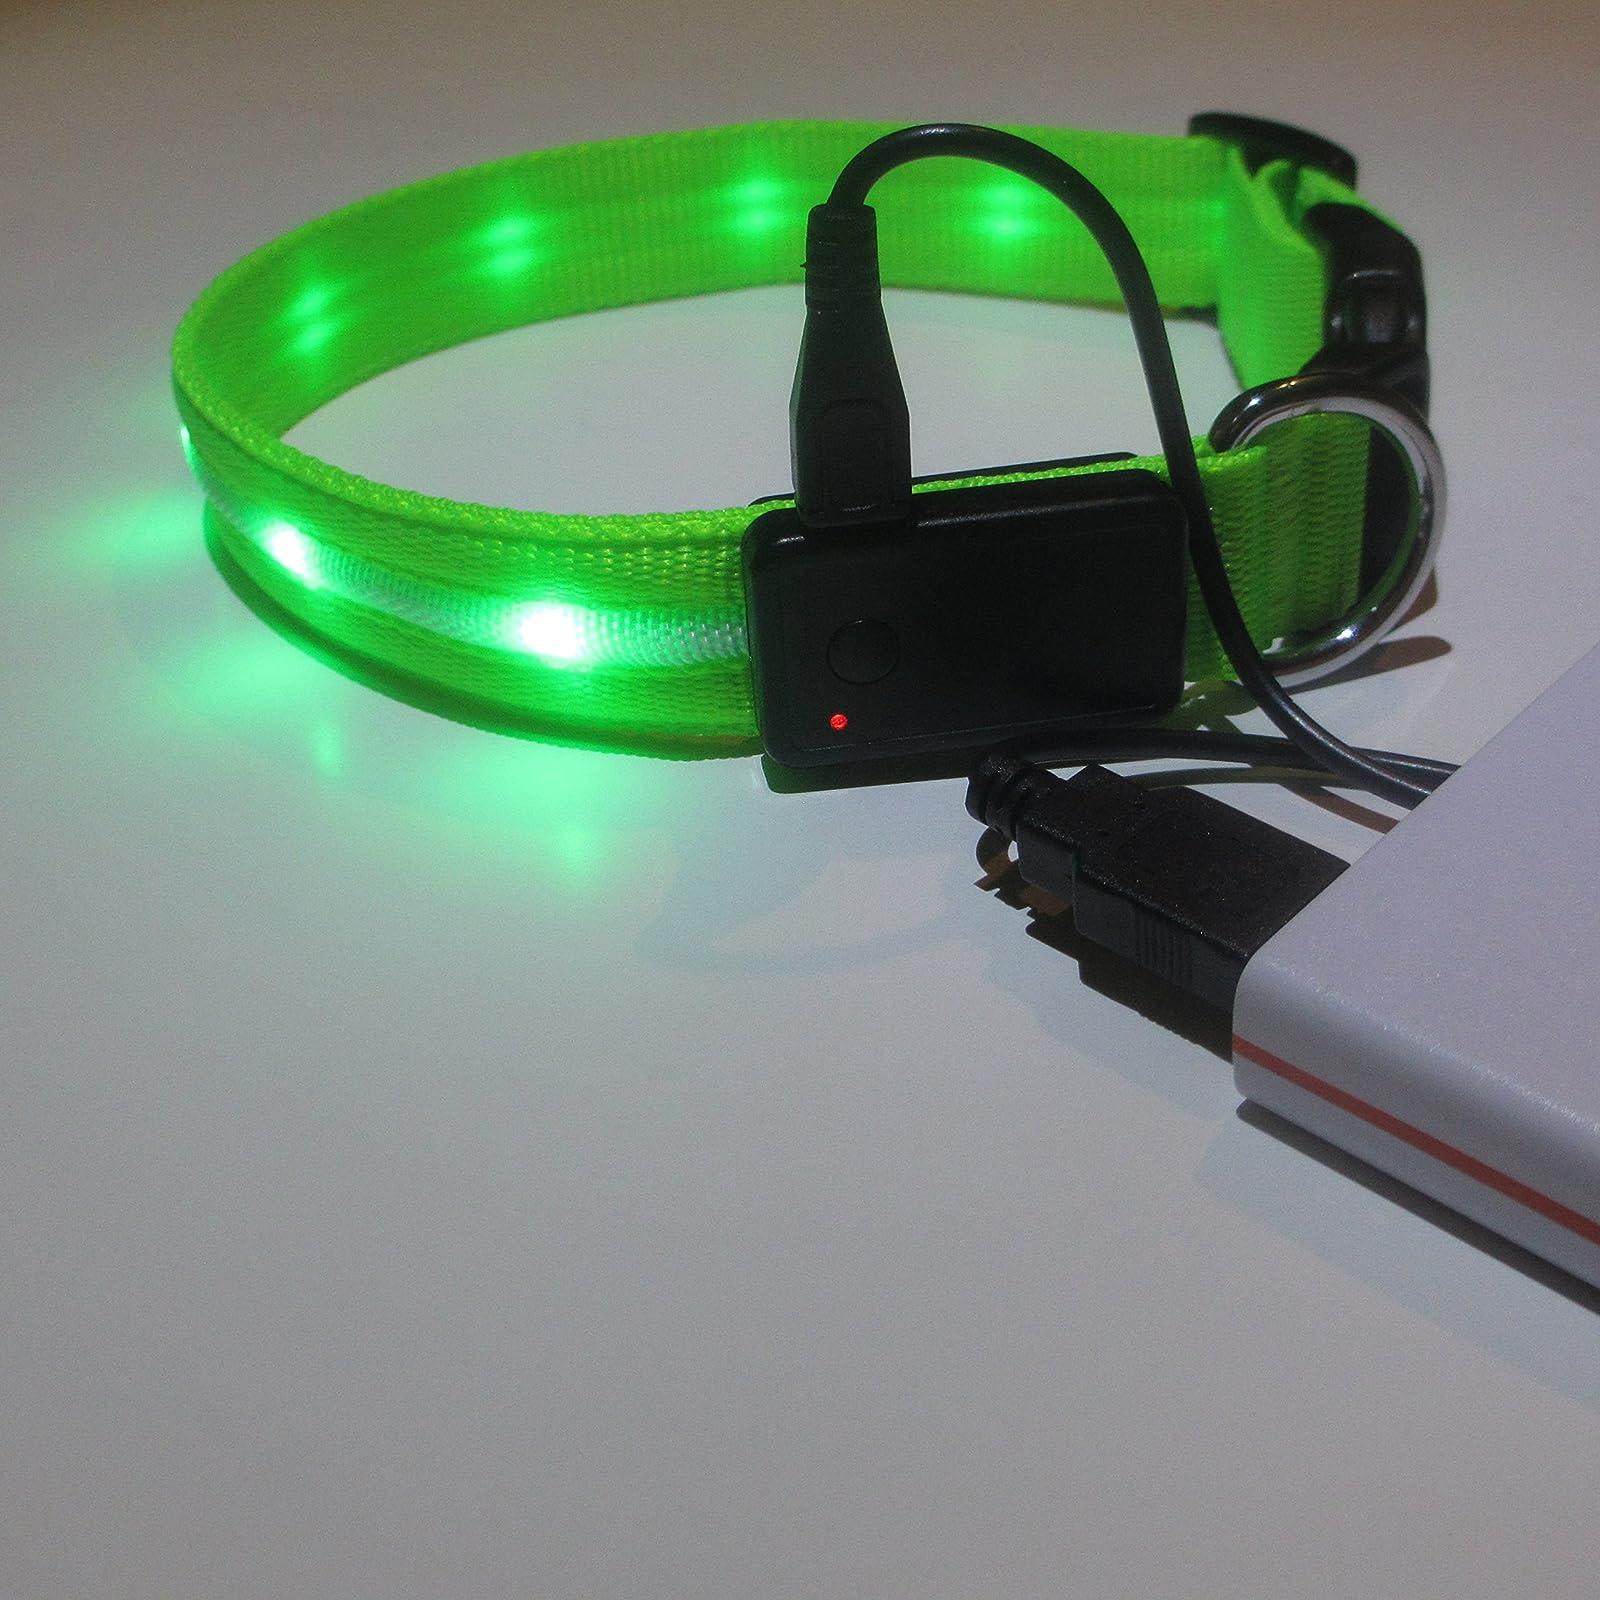 Blazin' Safety LED Dog Leash - USB Rechargeable - 3